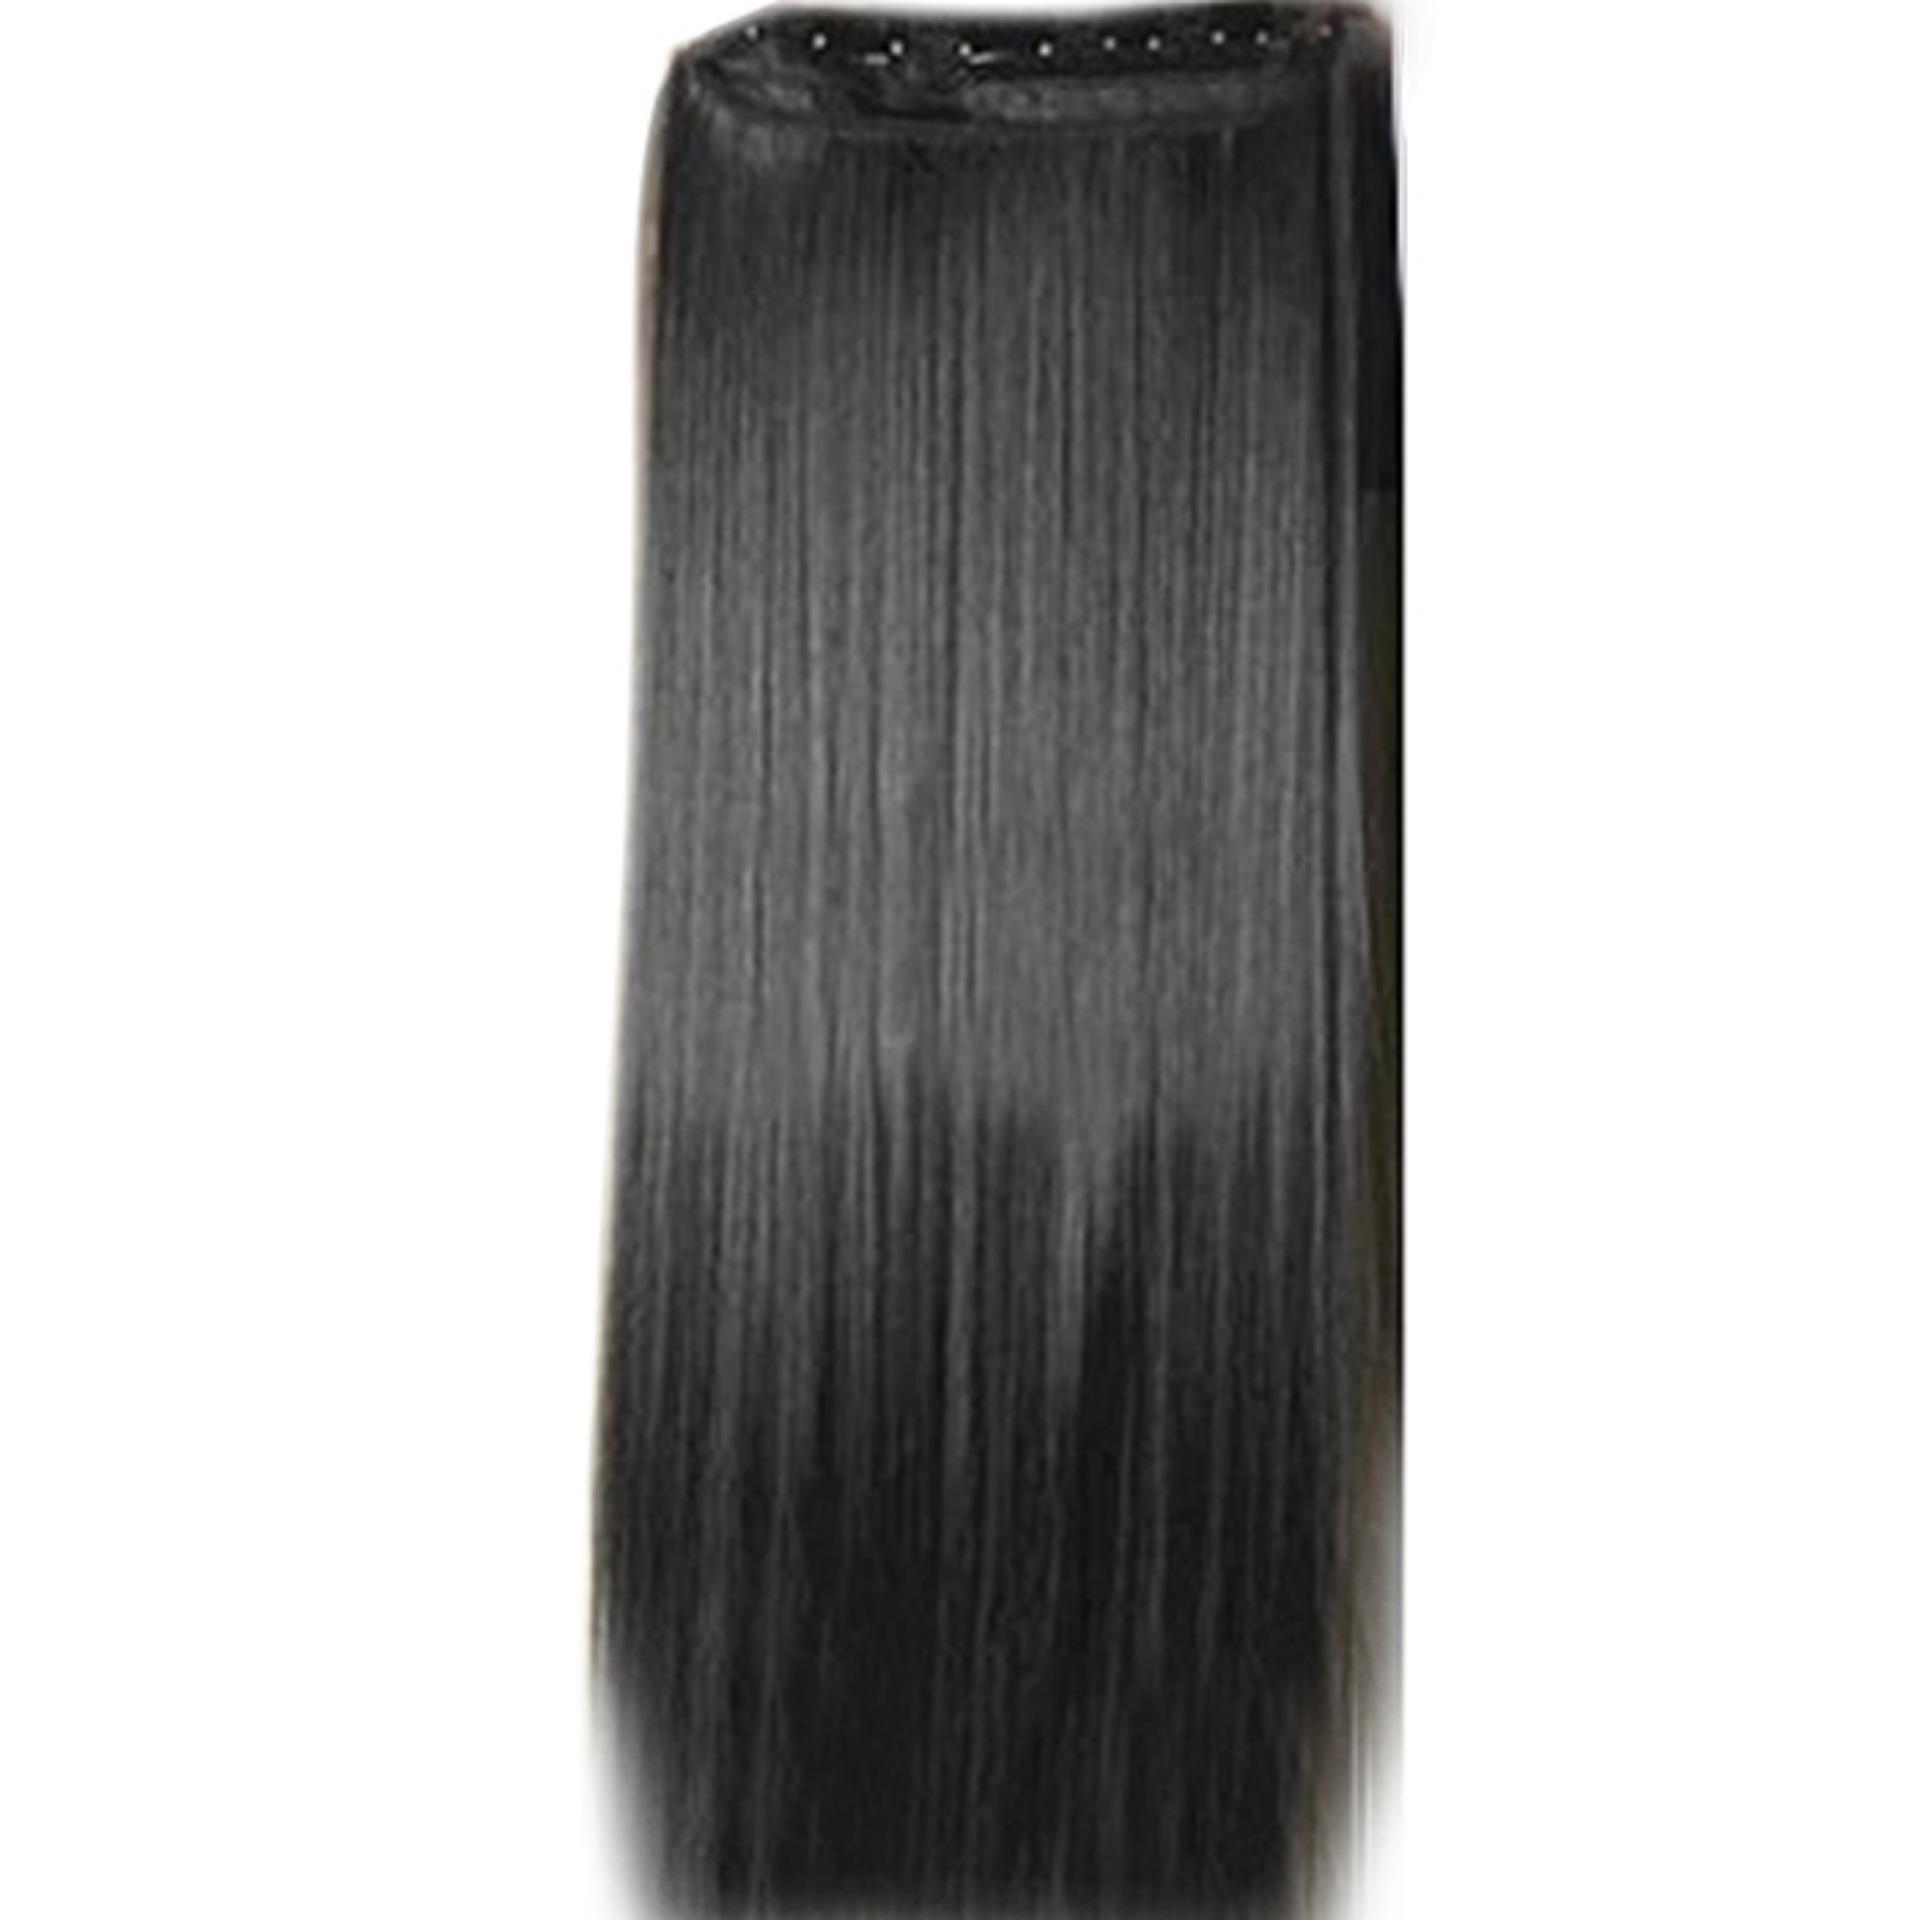 Gaya Fashion Rambut Lurus Panjang Klip Di Ekstensi Wig Sopak 20 Cm X 60 Cm  Matt  aaa92478f6